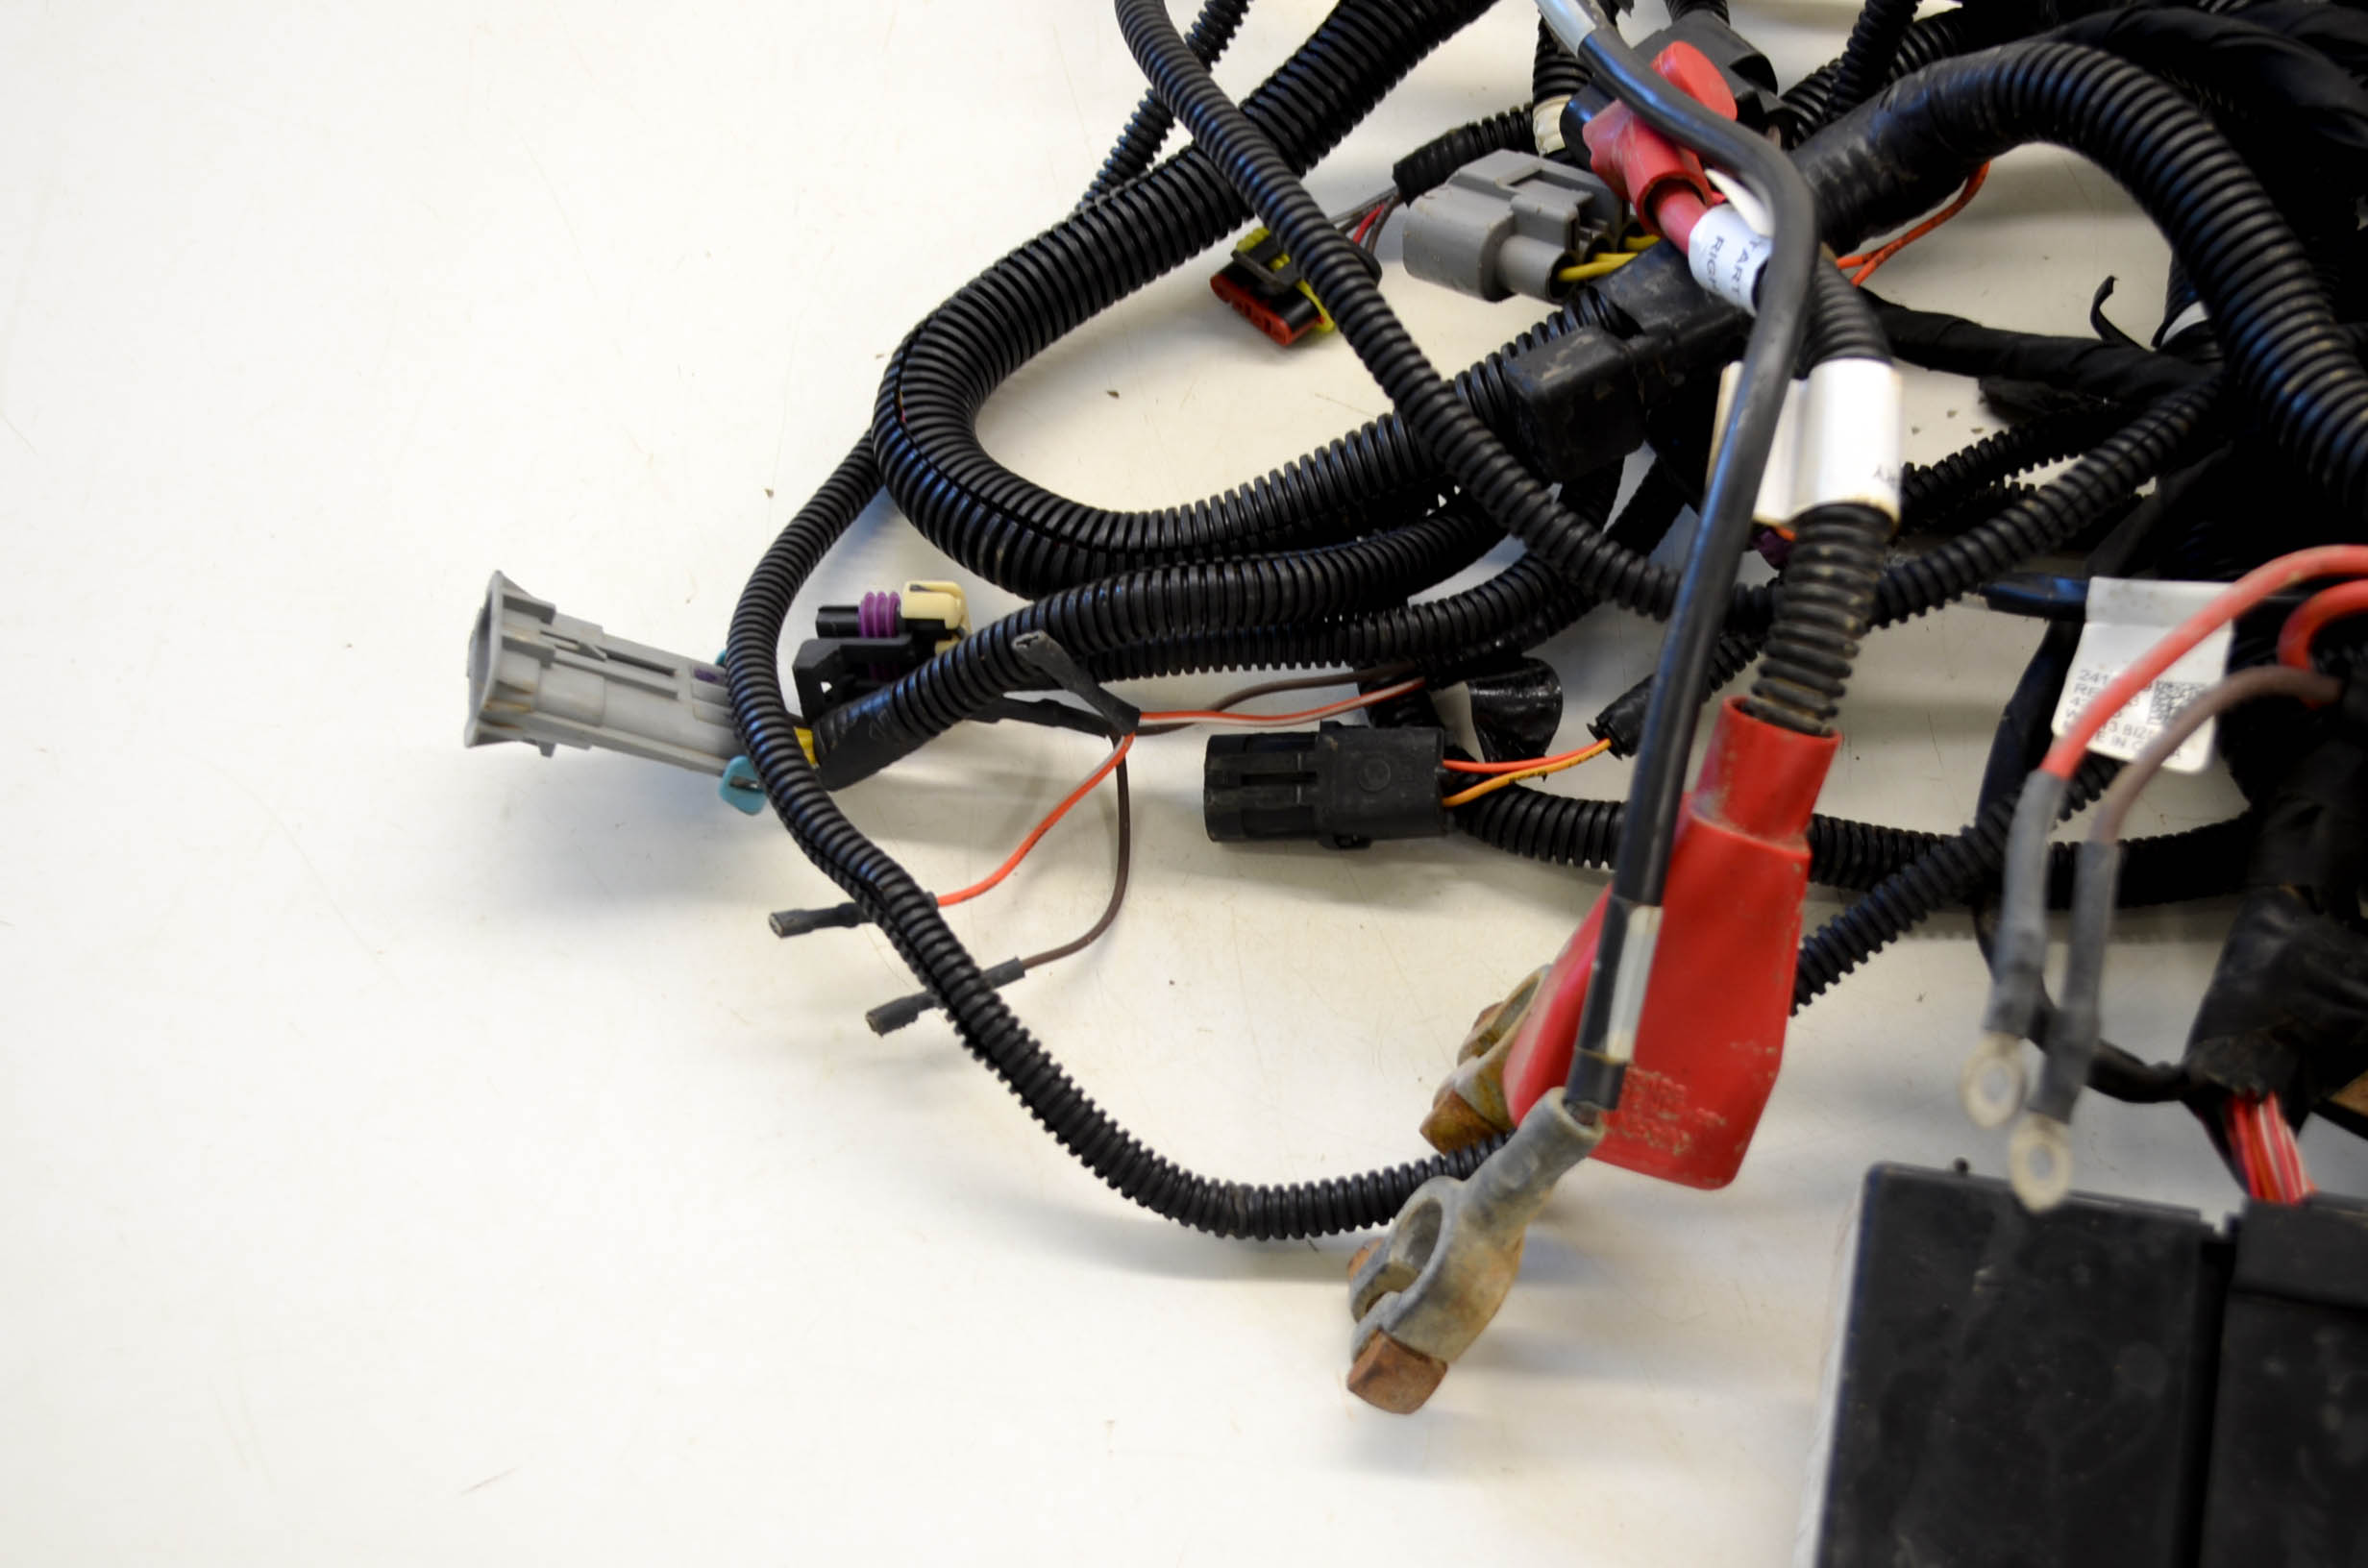 14 Polaris Ranger 800 EFI Wire Harness Electrical Wiring EPS 4x4